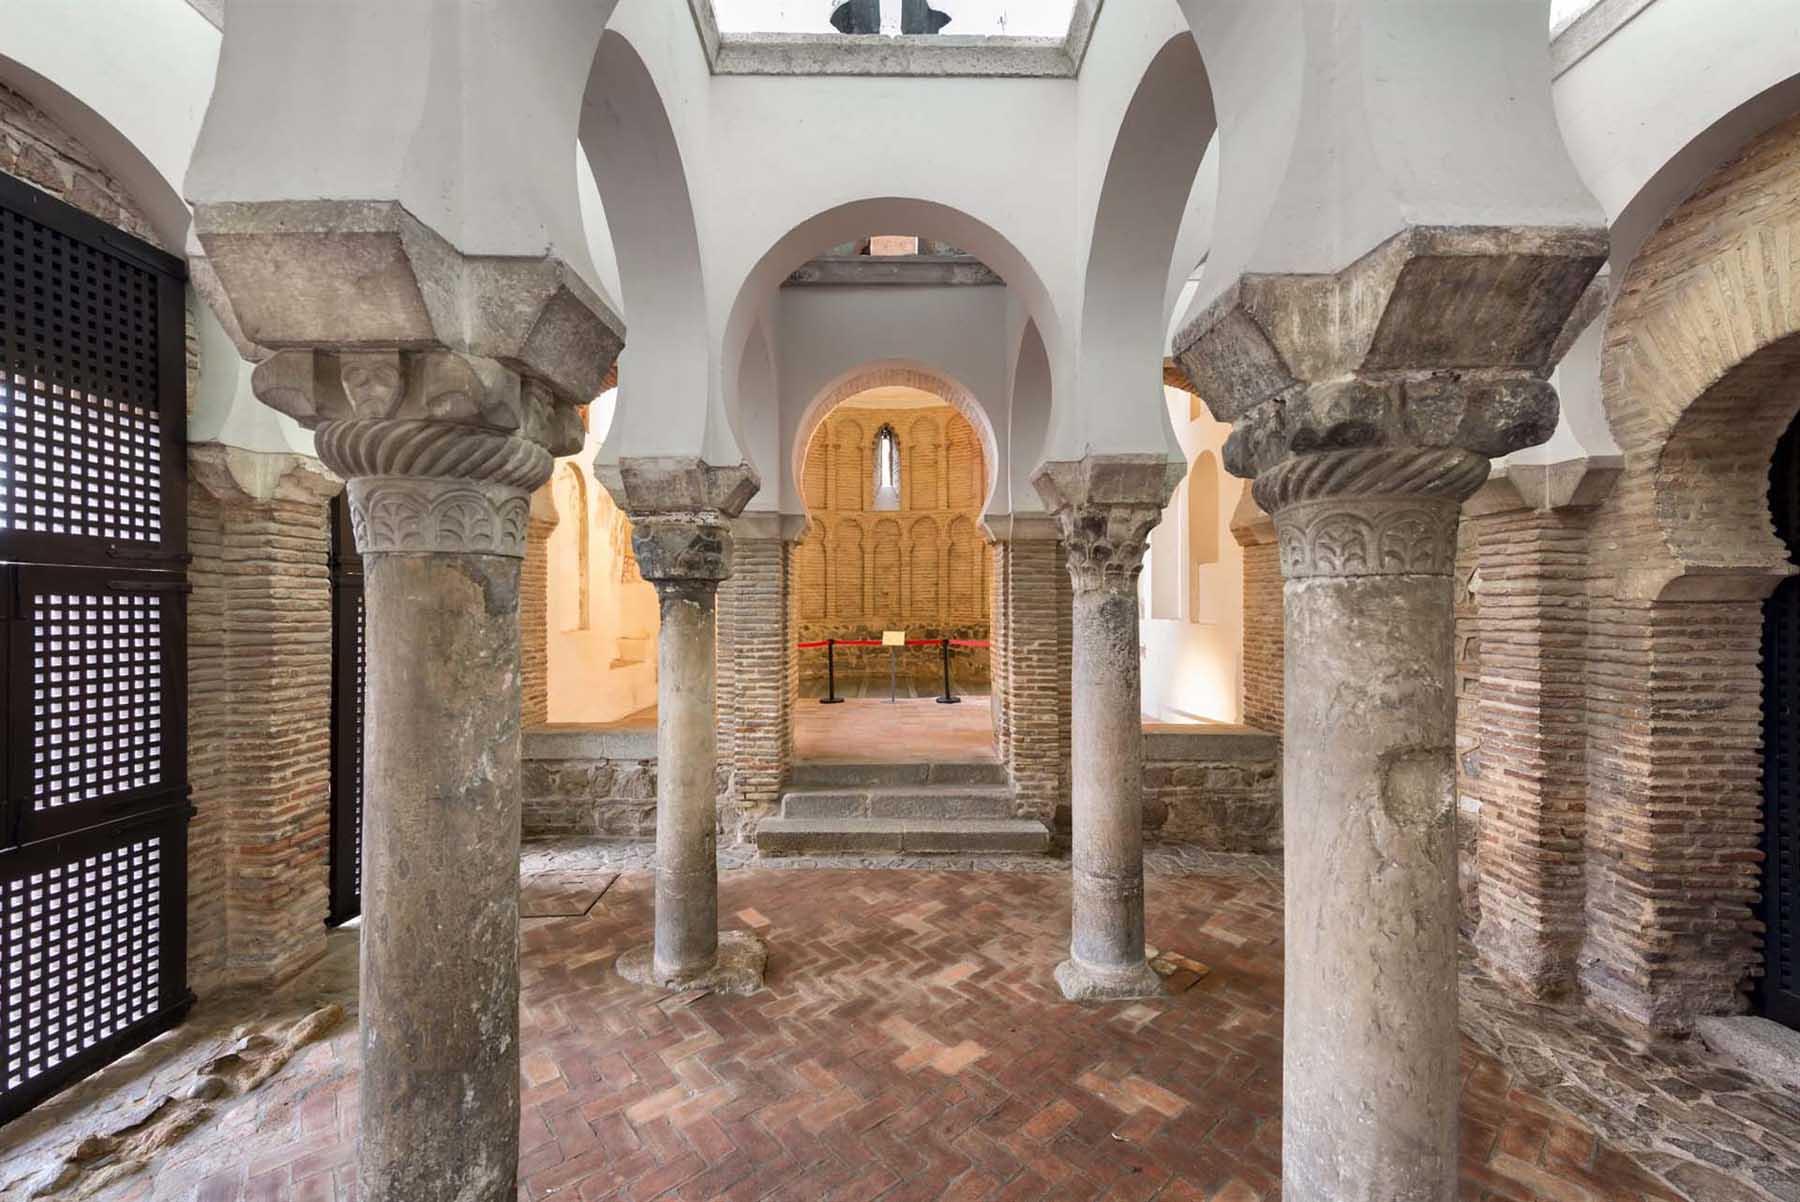 Mezquita-Cristo-de-la-Luz-53-TOLEDO_MONUMENTAL